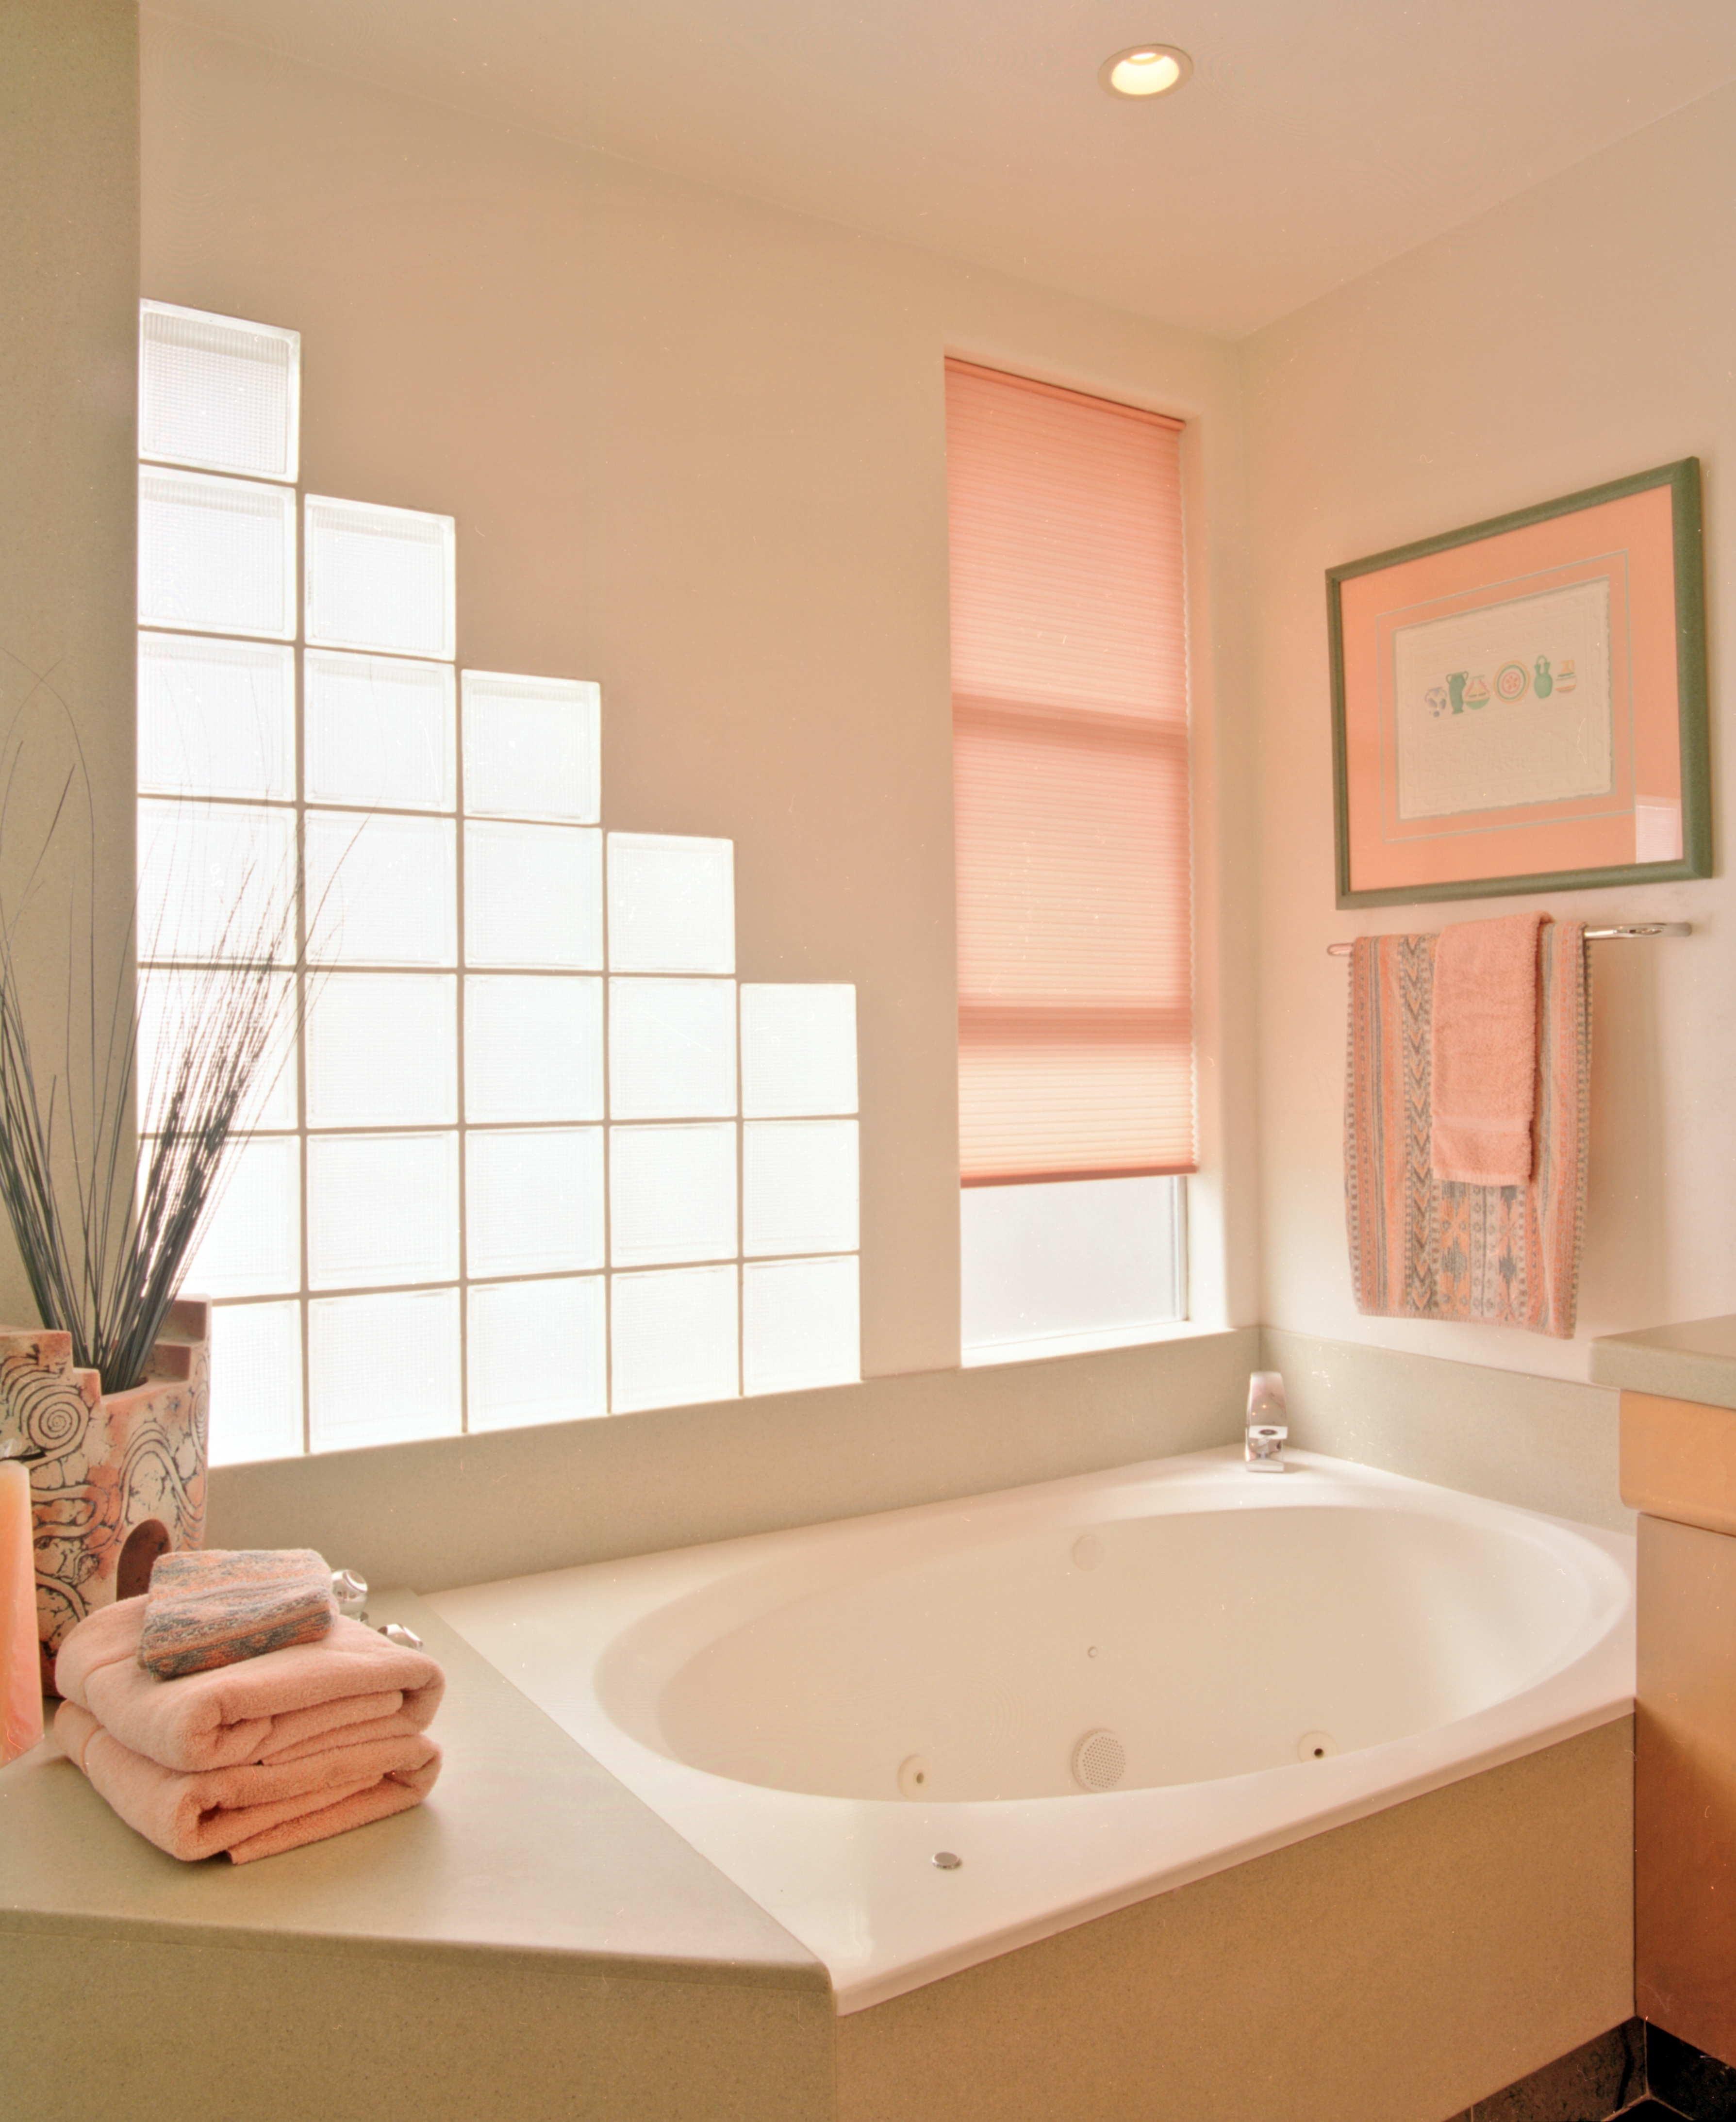 Slab granite countertops: Cultured marble tub surround manufacturers